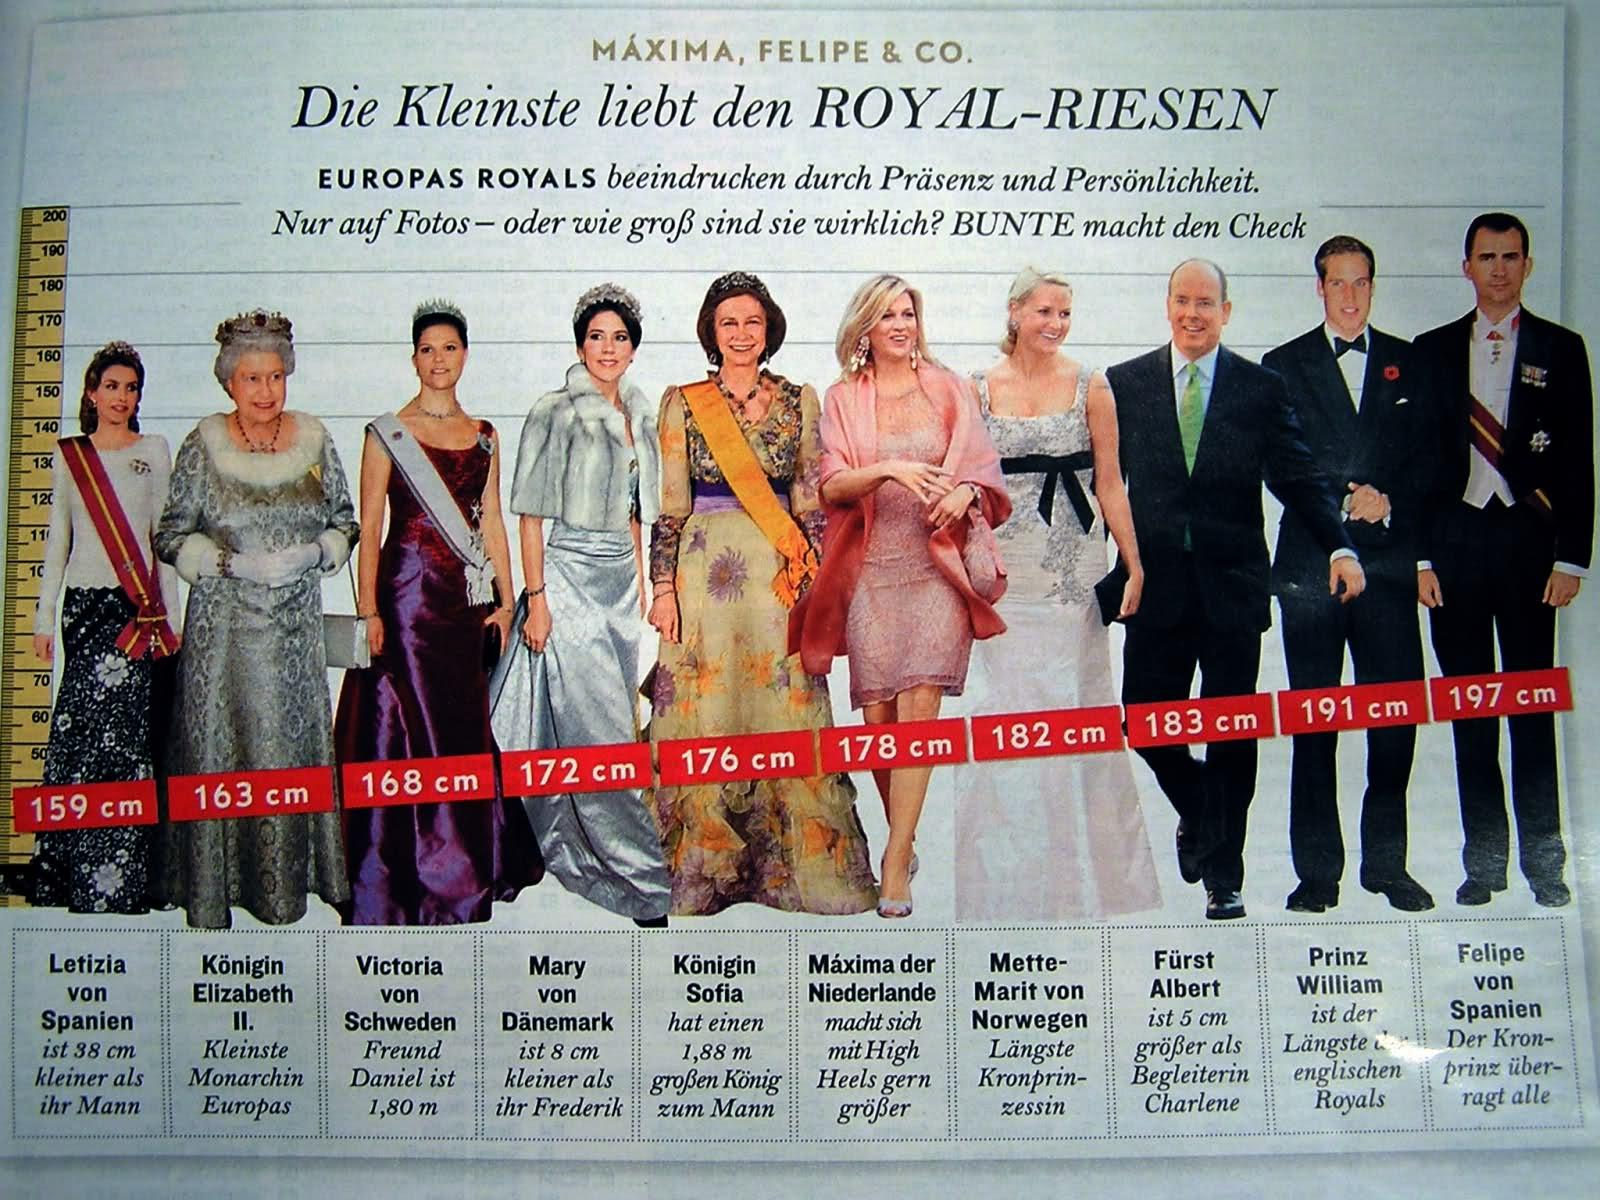 ¿Cuánto mide la Reina Letizia Ortiz? - Altura - Real height Vdzjmt